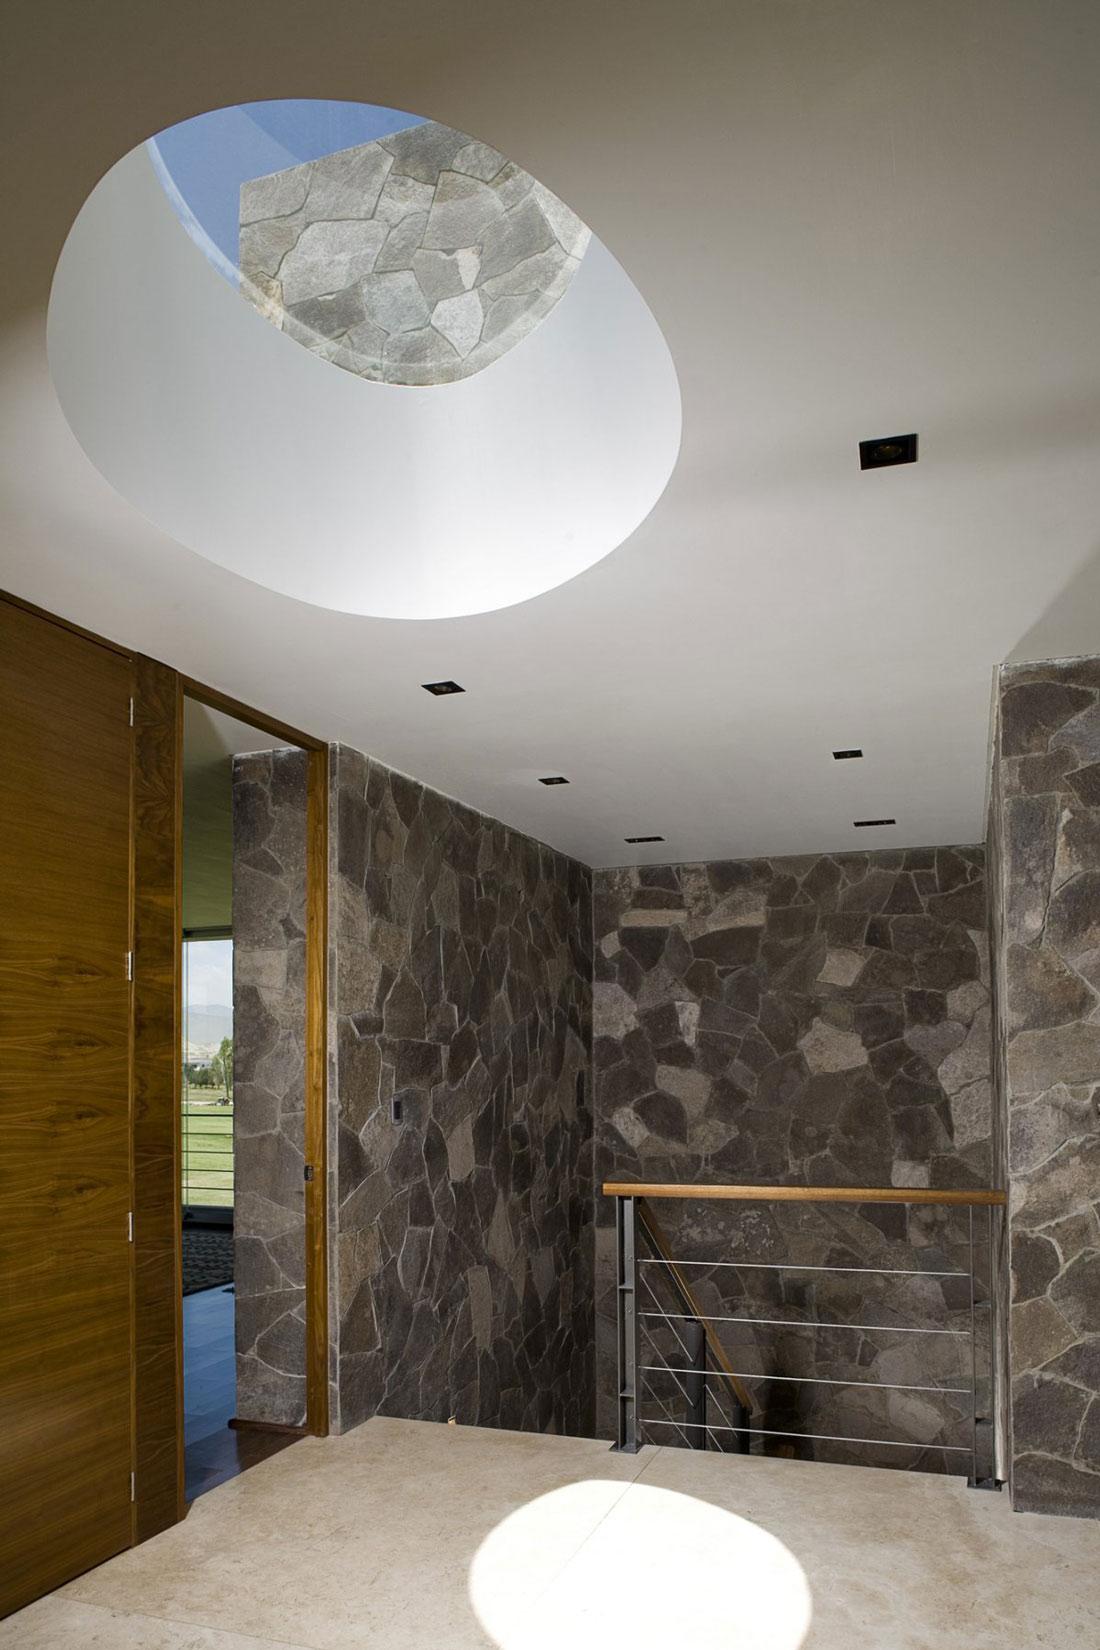 Stairs, Skylight, GP House in Hidalgo, Mexico by Bitar Arquitectos